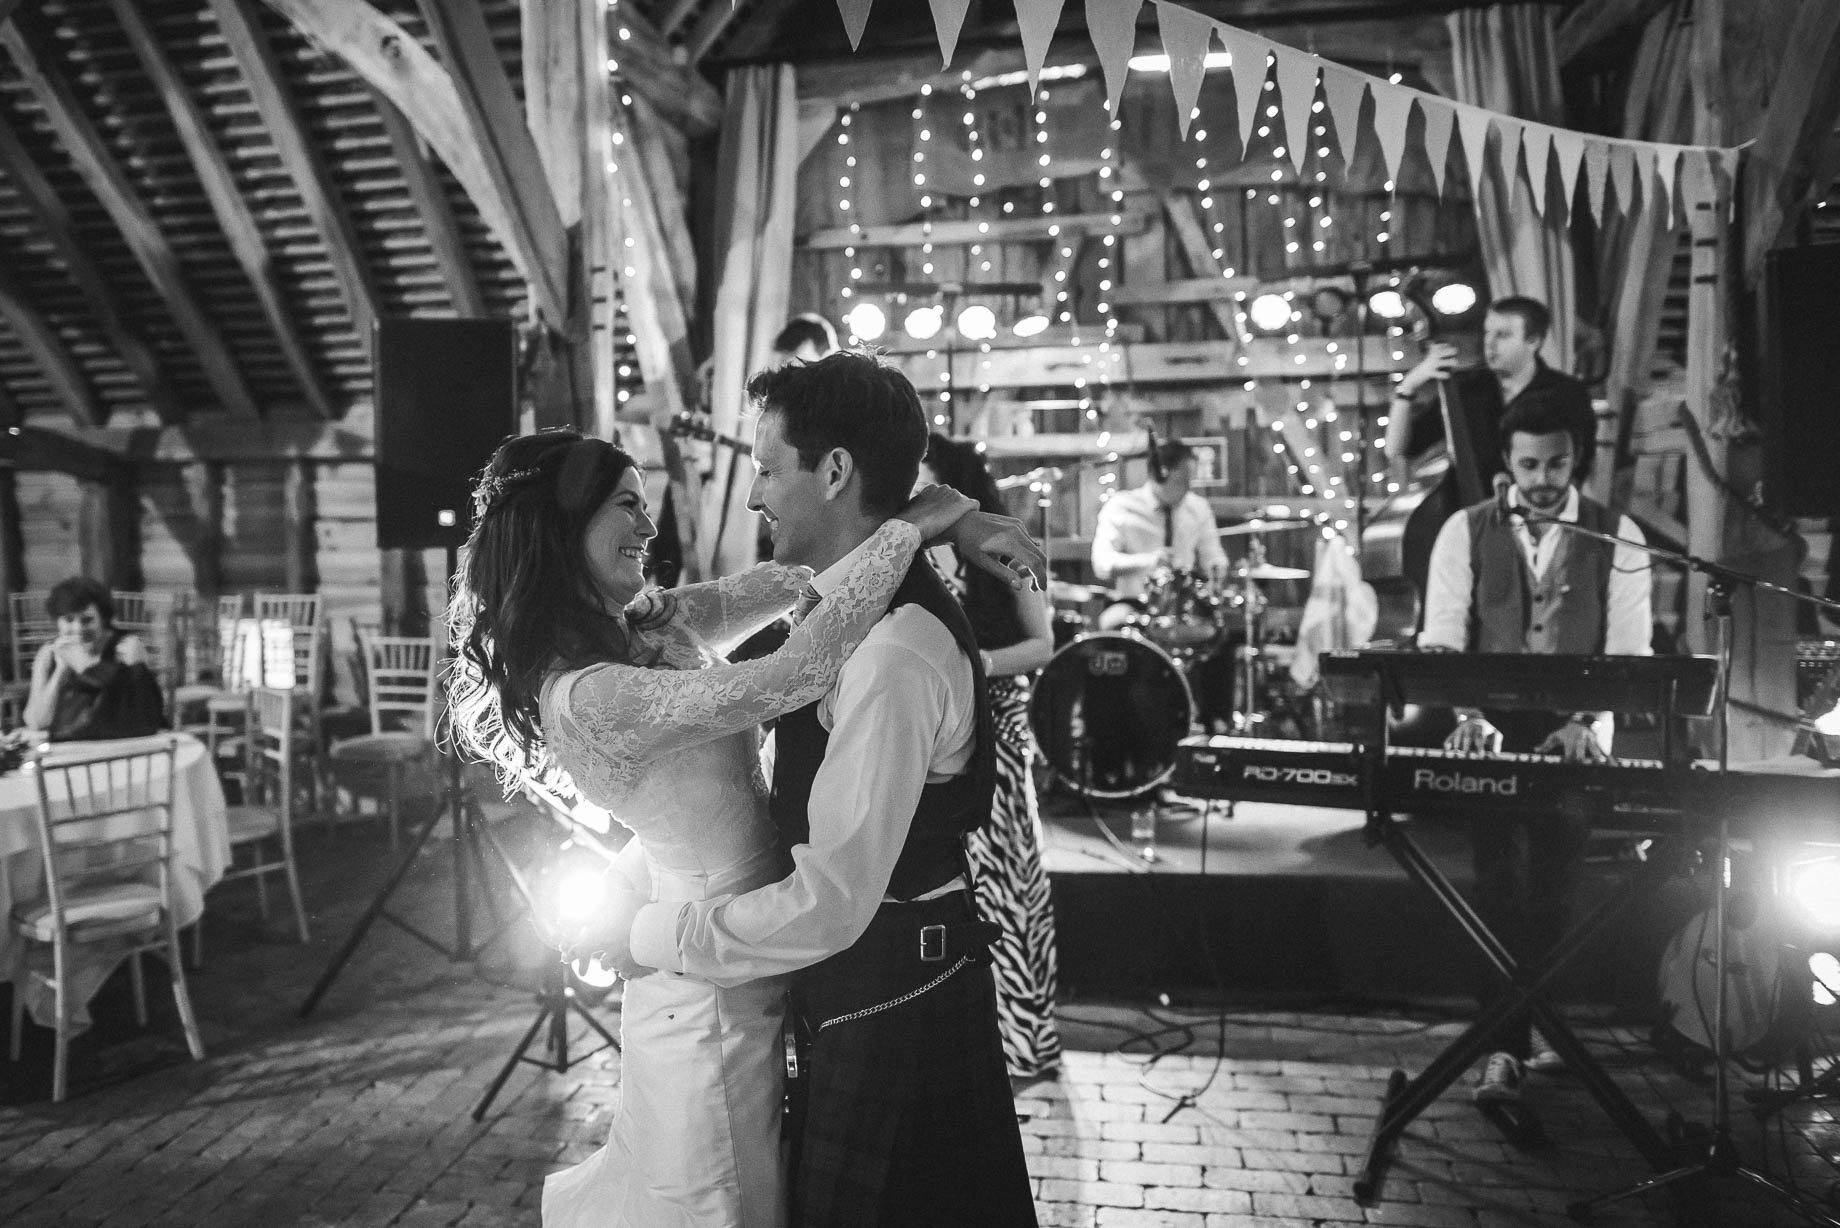 Gildings Barn wedding photography - Sarah and Steve (176 of 190)